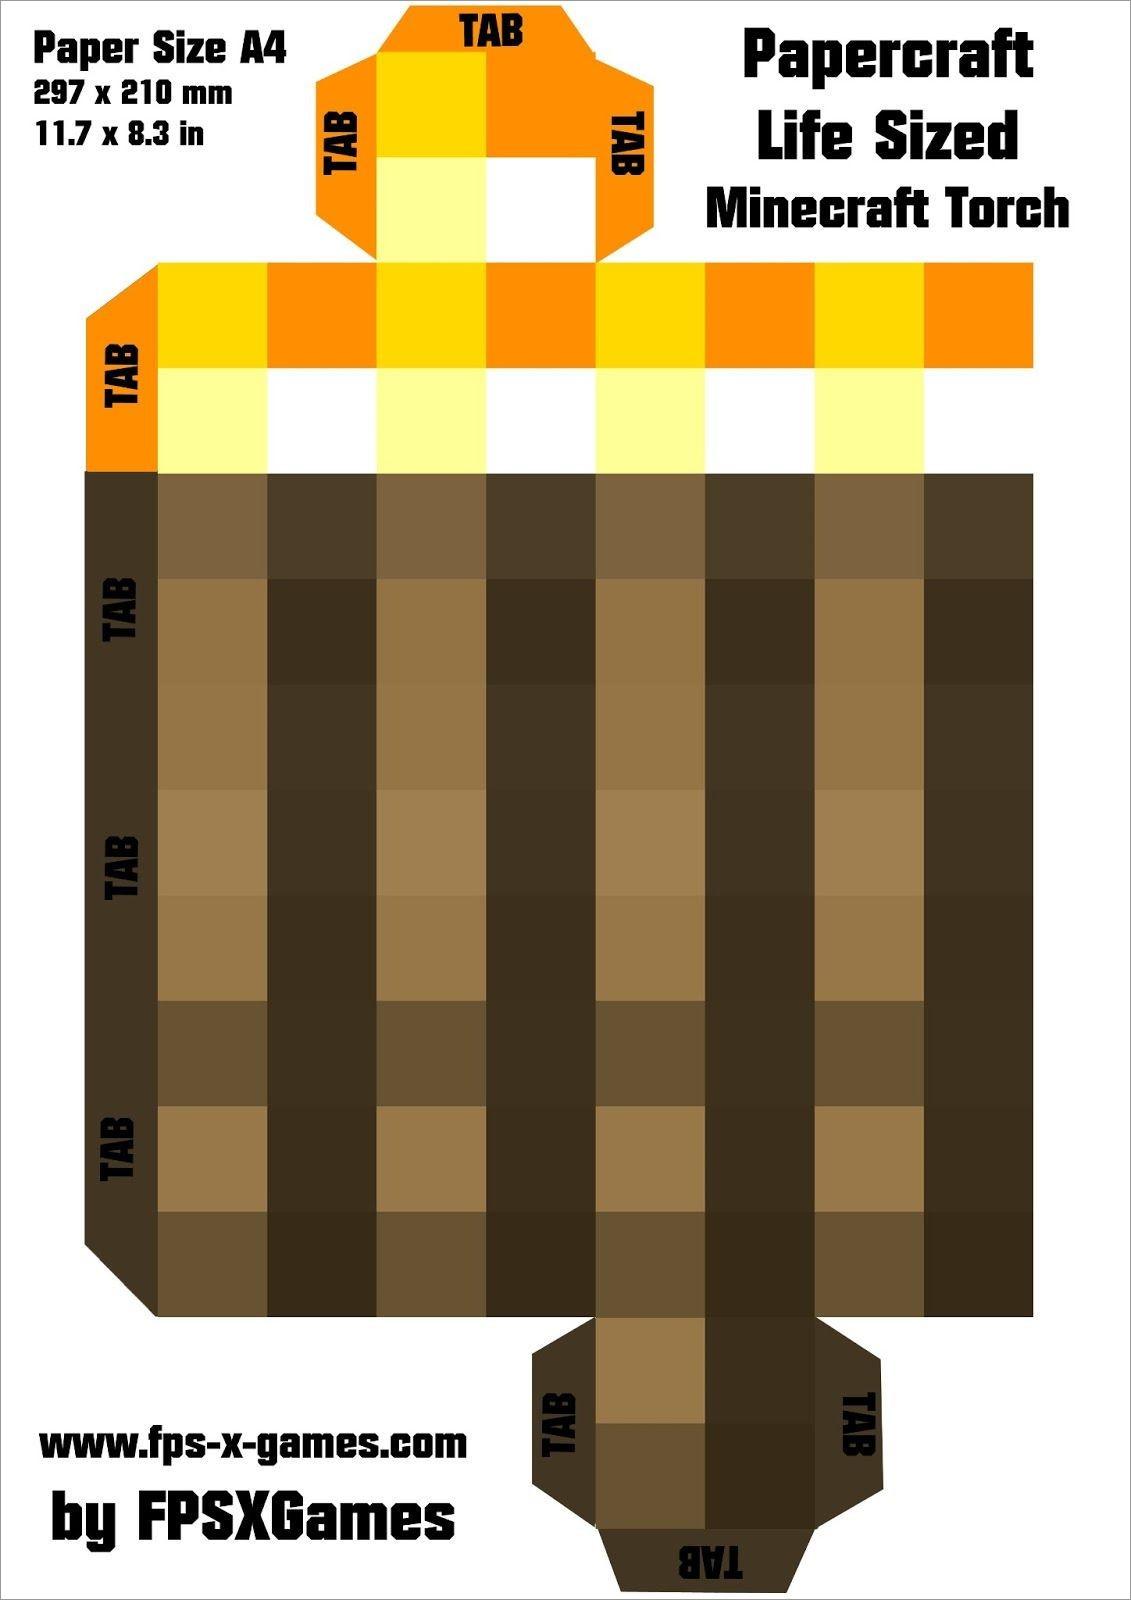 Minecraft Papercraft Models Printable Minecraft torch Papercraft